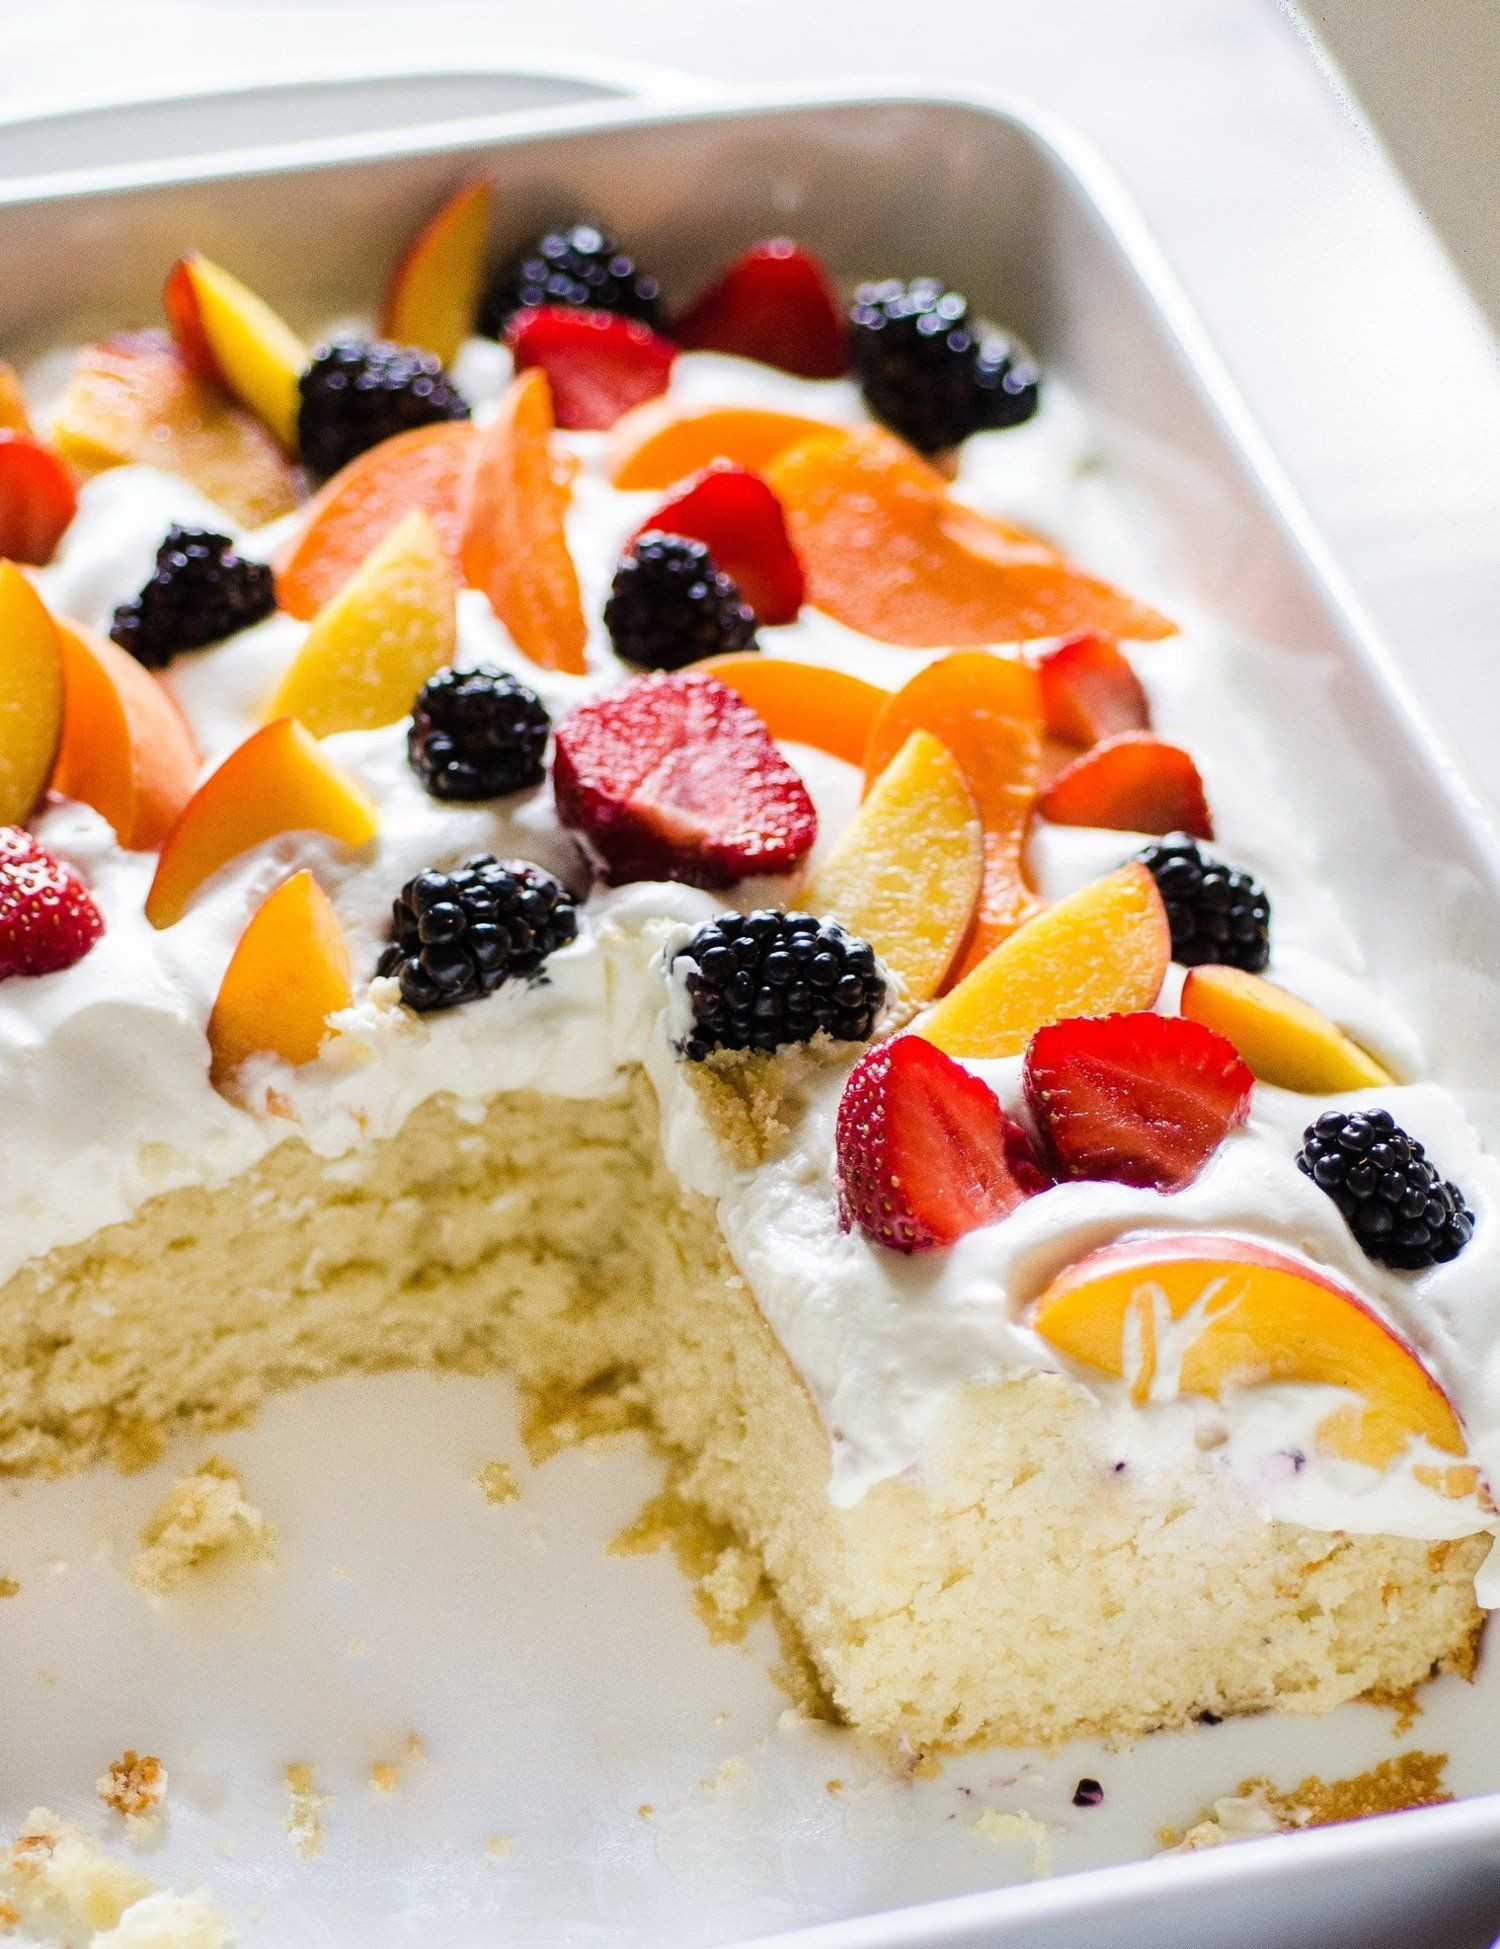 Summer Fruits Desserts  Easy Summer Cake with Fruit & Cream Recipe